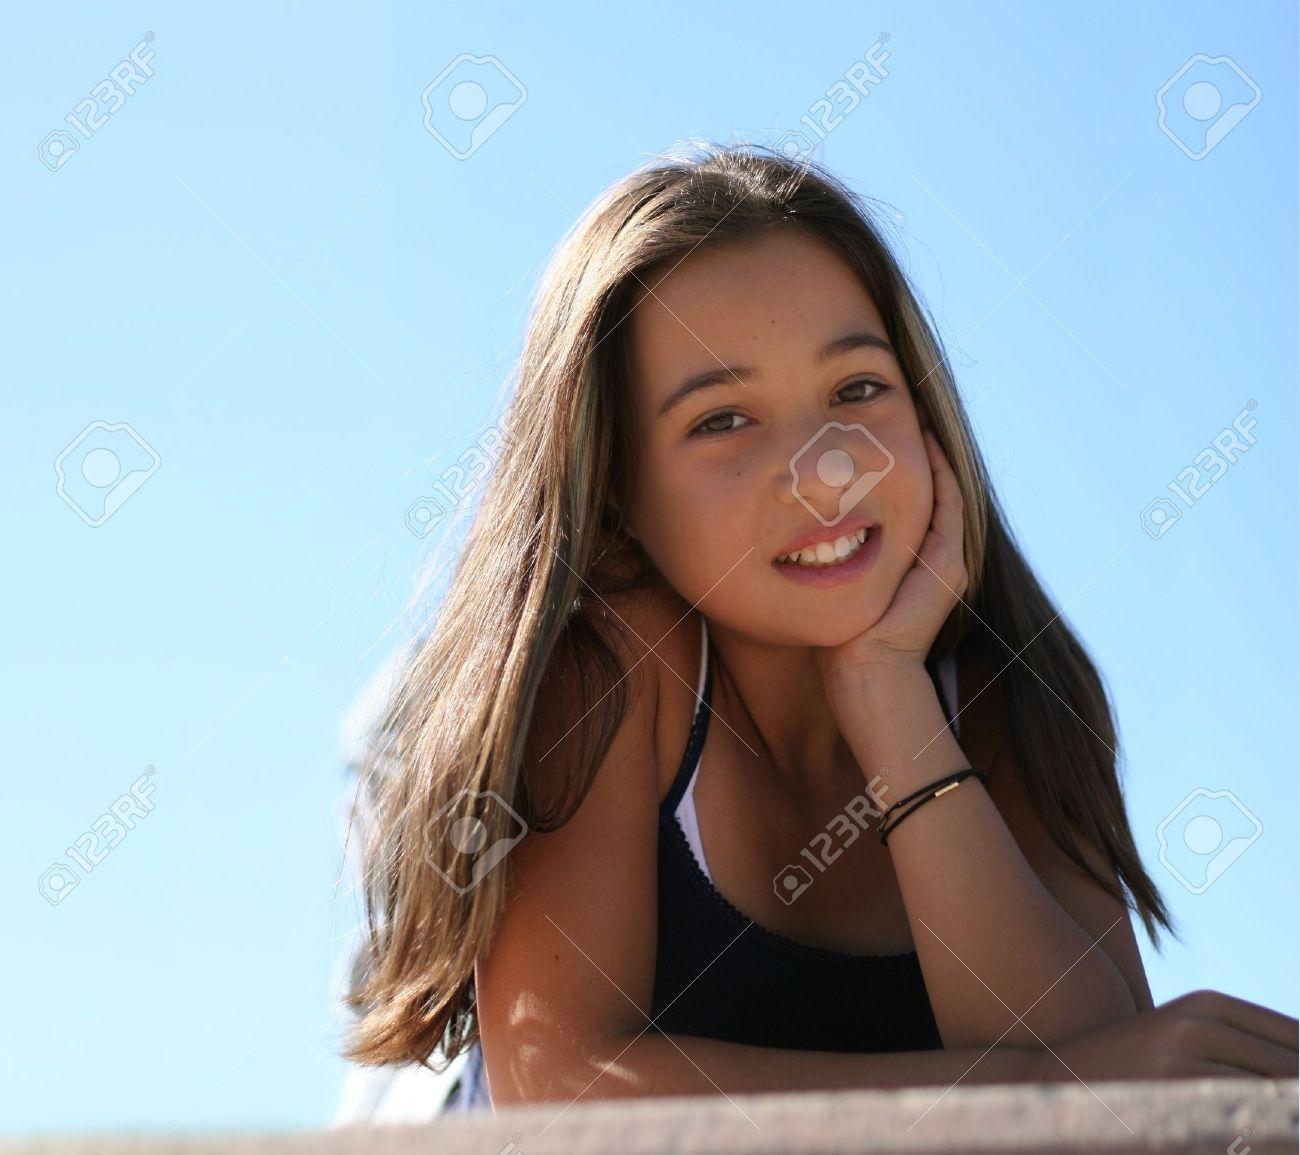 اجمل صور بنات 2020 اجمل صور بنات اطفال خلفيات بنات صغيره جميلة جدا 62